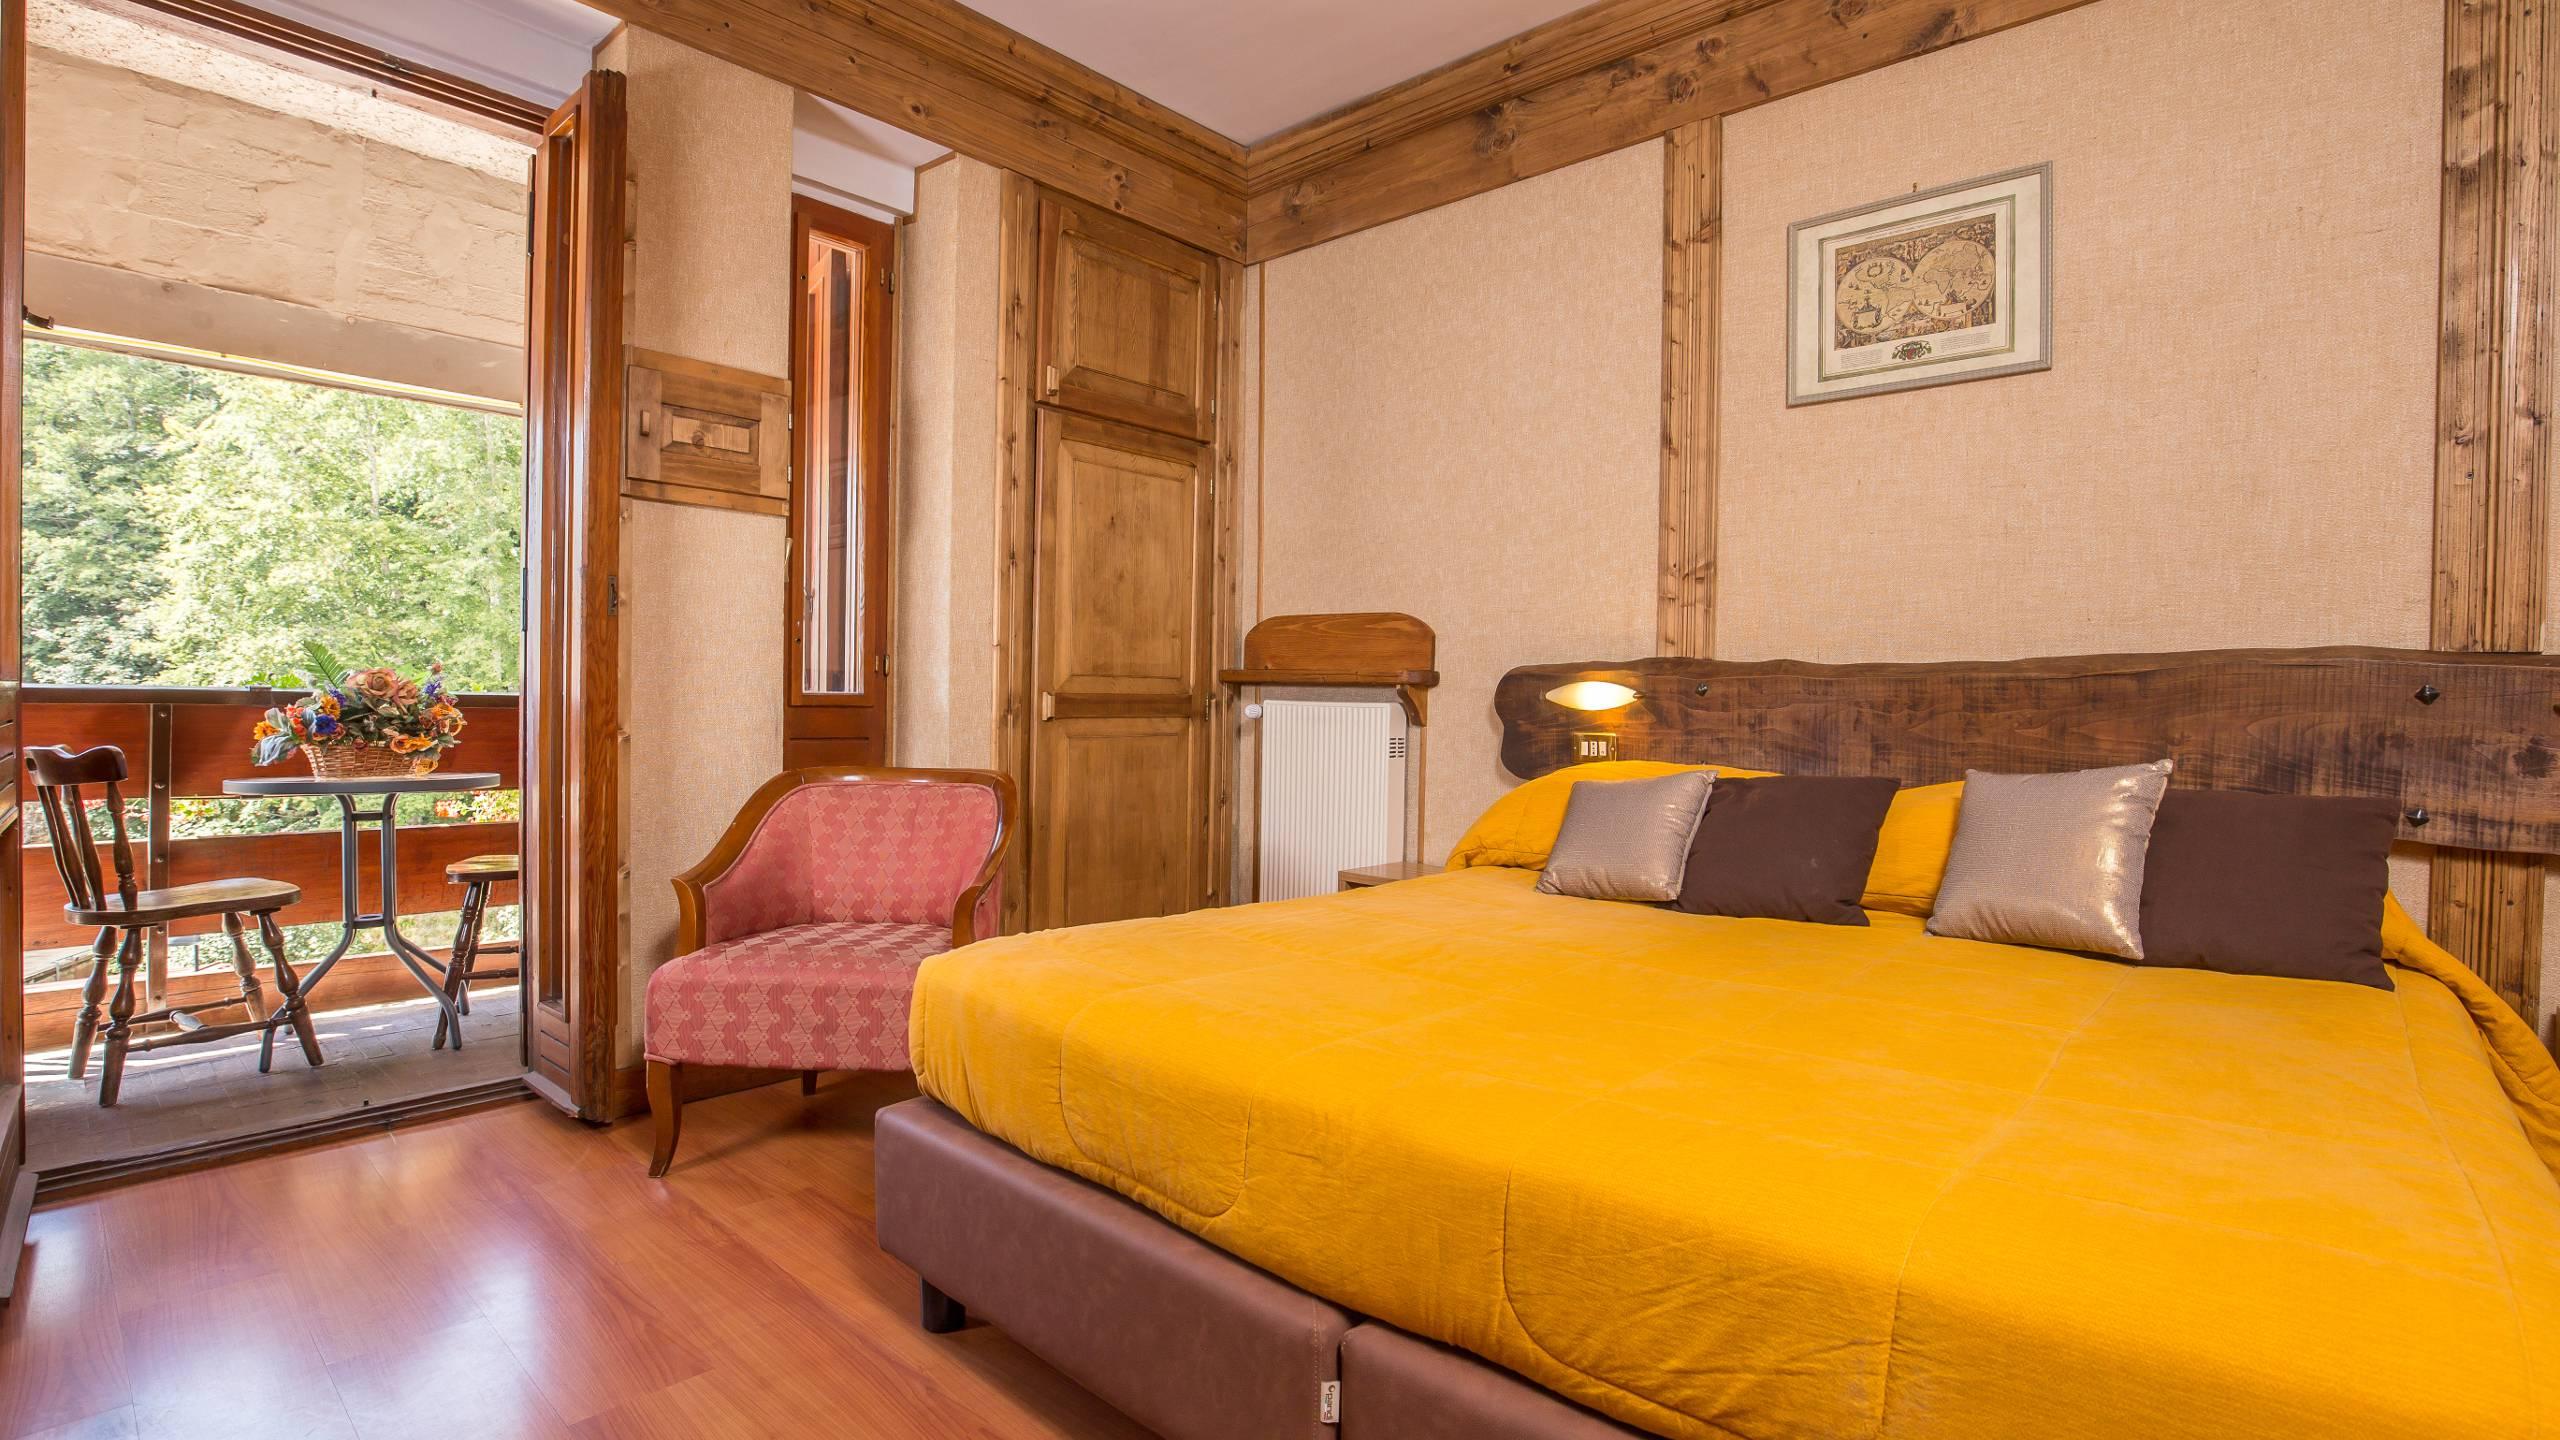 Hotel-Togo-Palace-Terminillo-Rieti-room-055